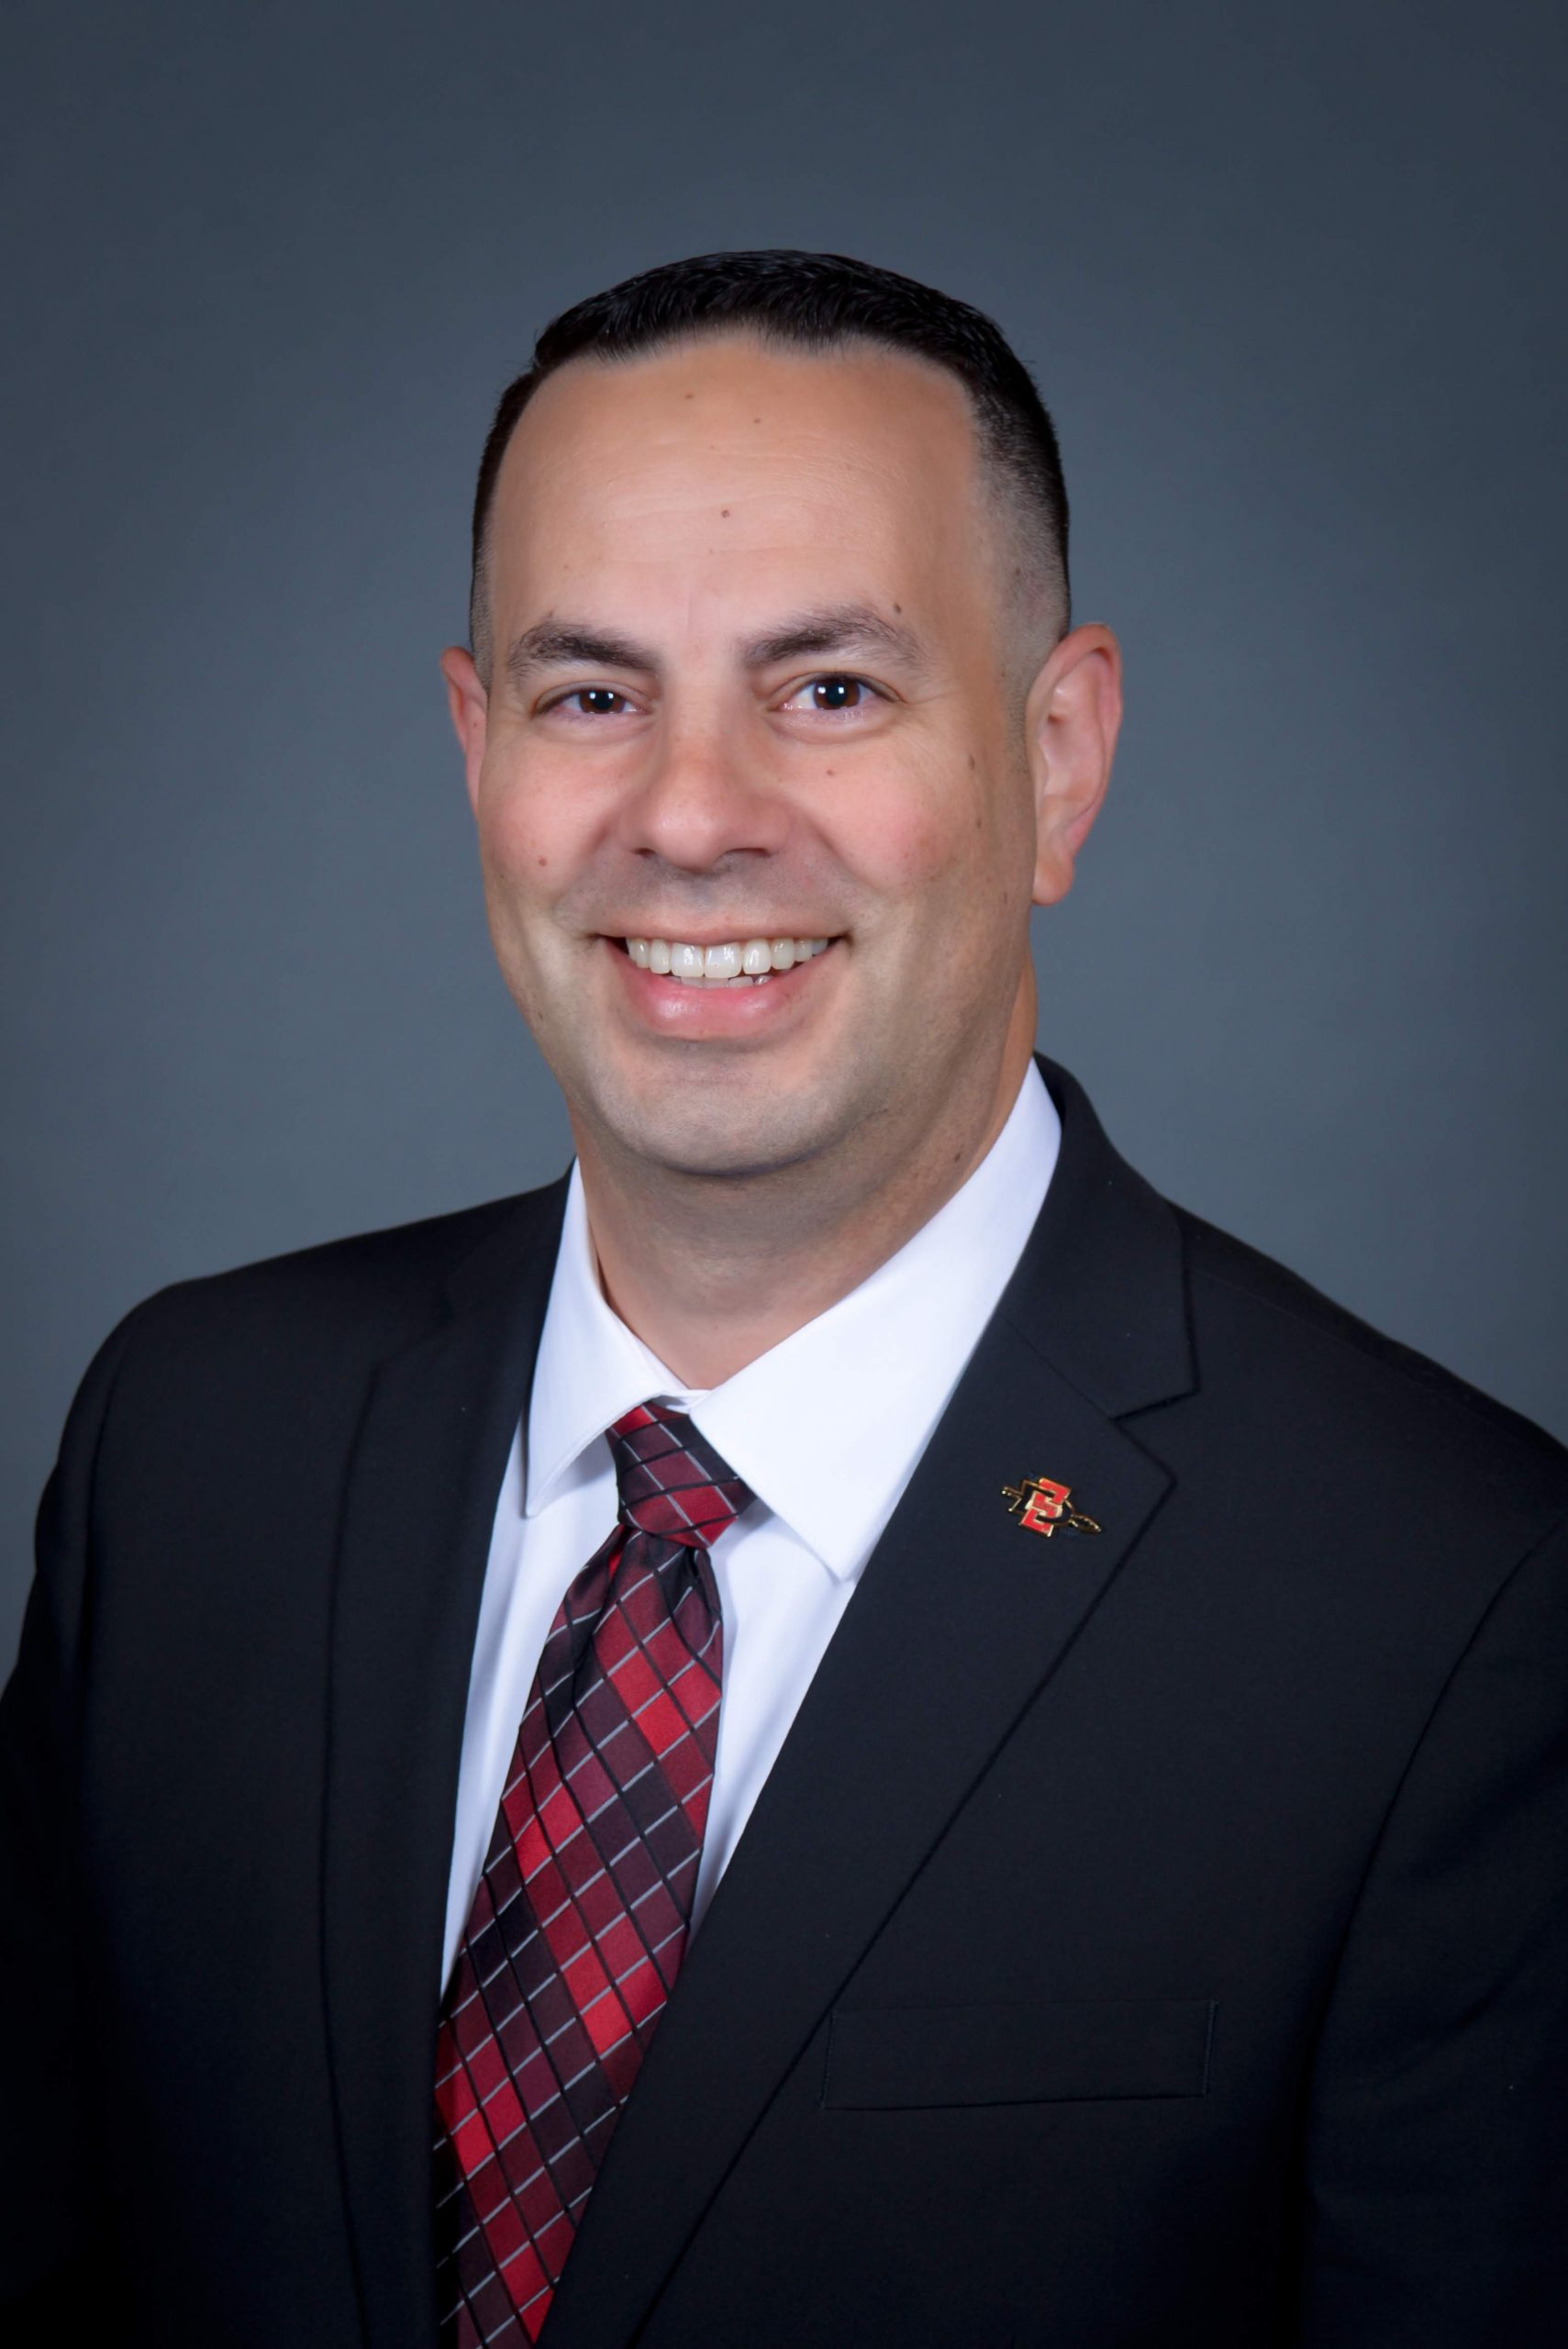 Jason Farran - President